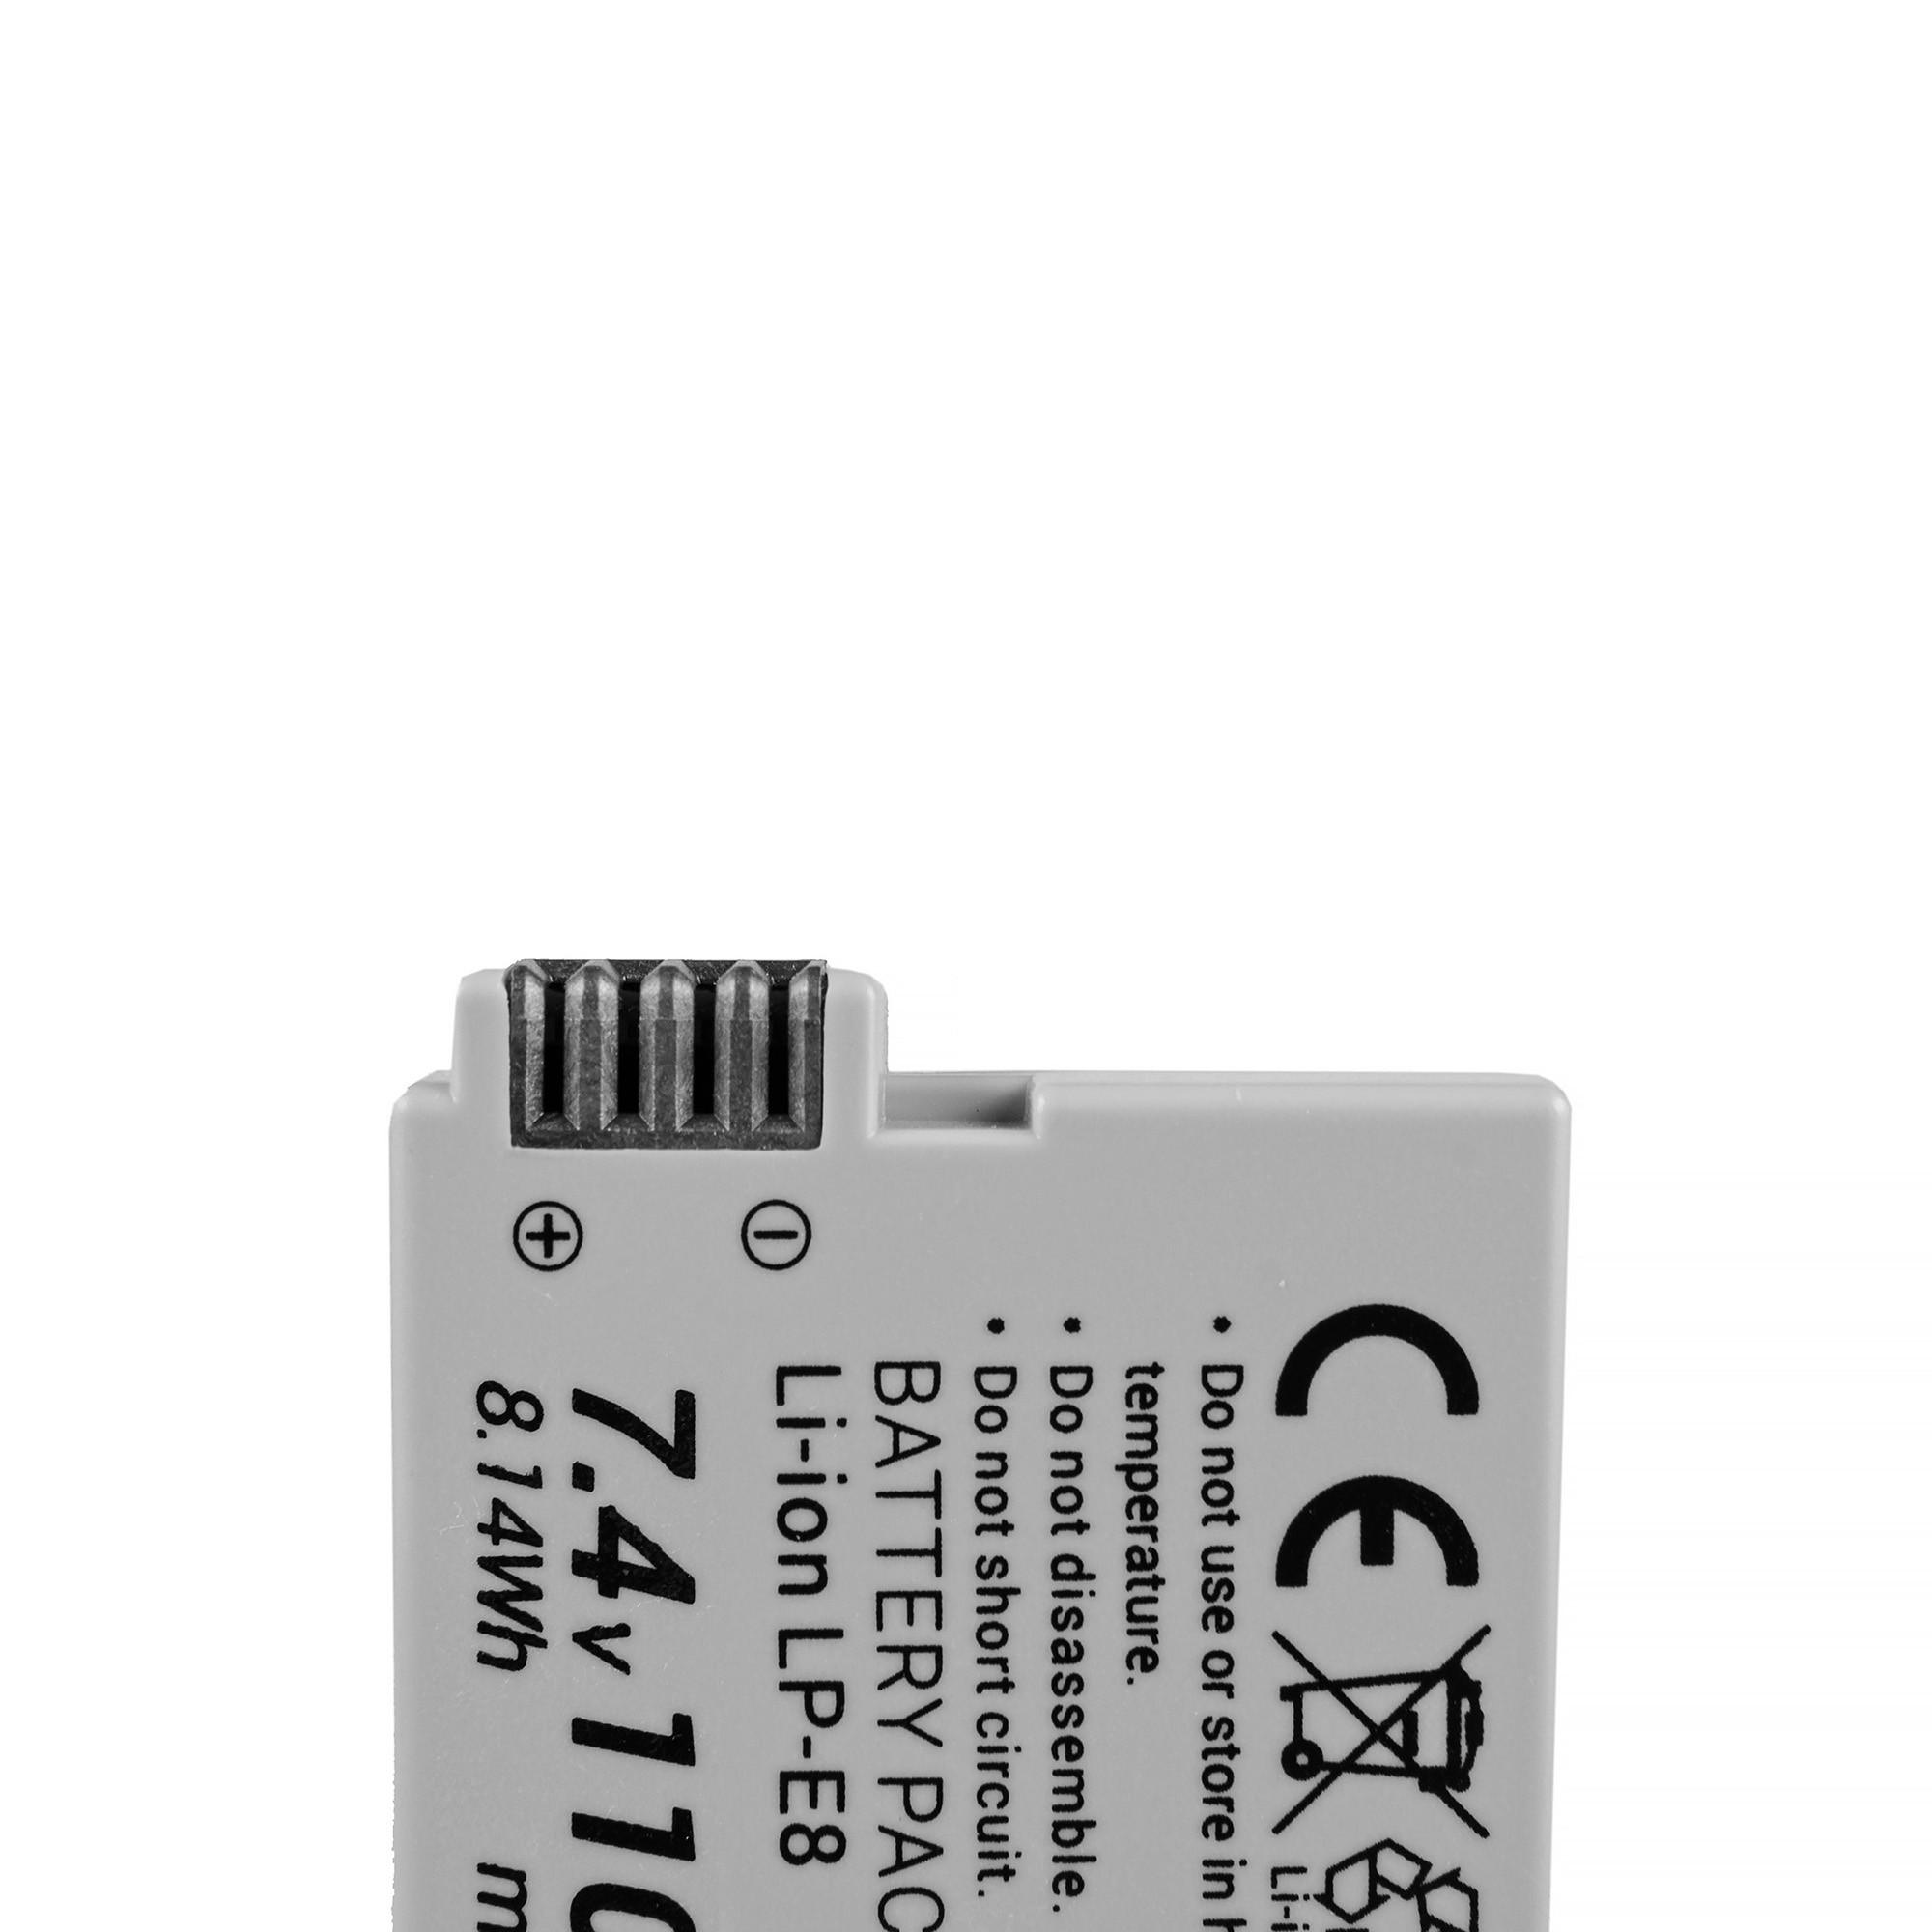 Green Cell Baterie LP-E8   Canon EOS Rebel T2i, T3i, T4i, T5i, EOS 600D, 550D, 650D, 700D, Kiss X5, X4, X6 7.4V 1100mAh